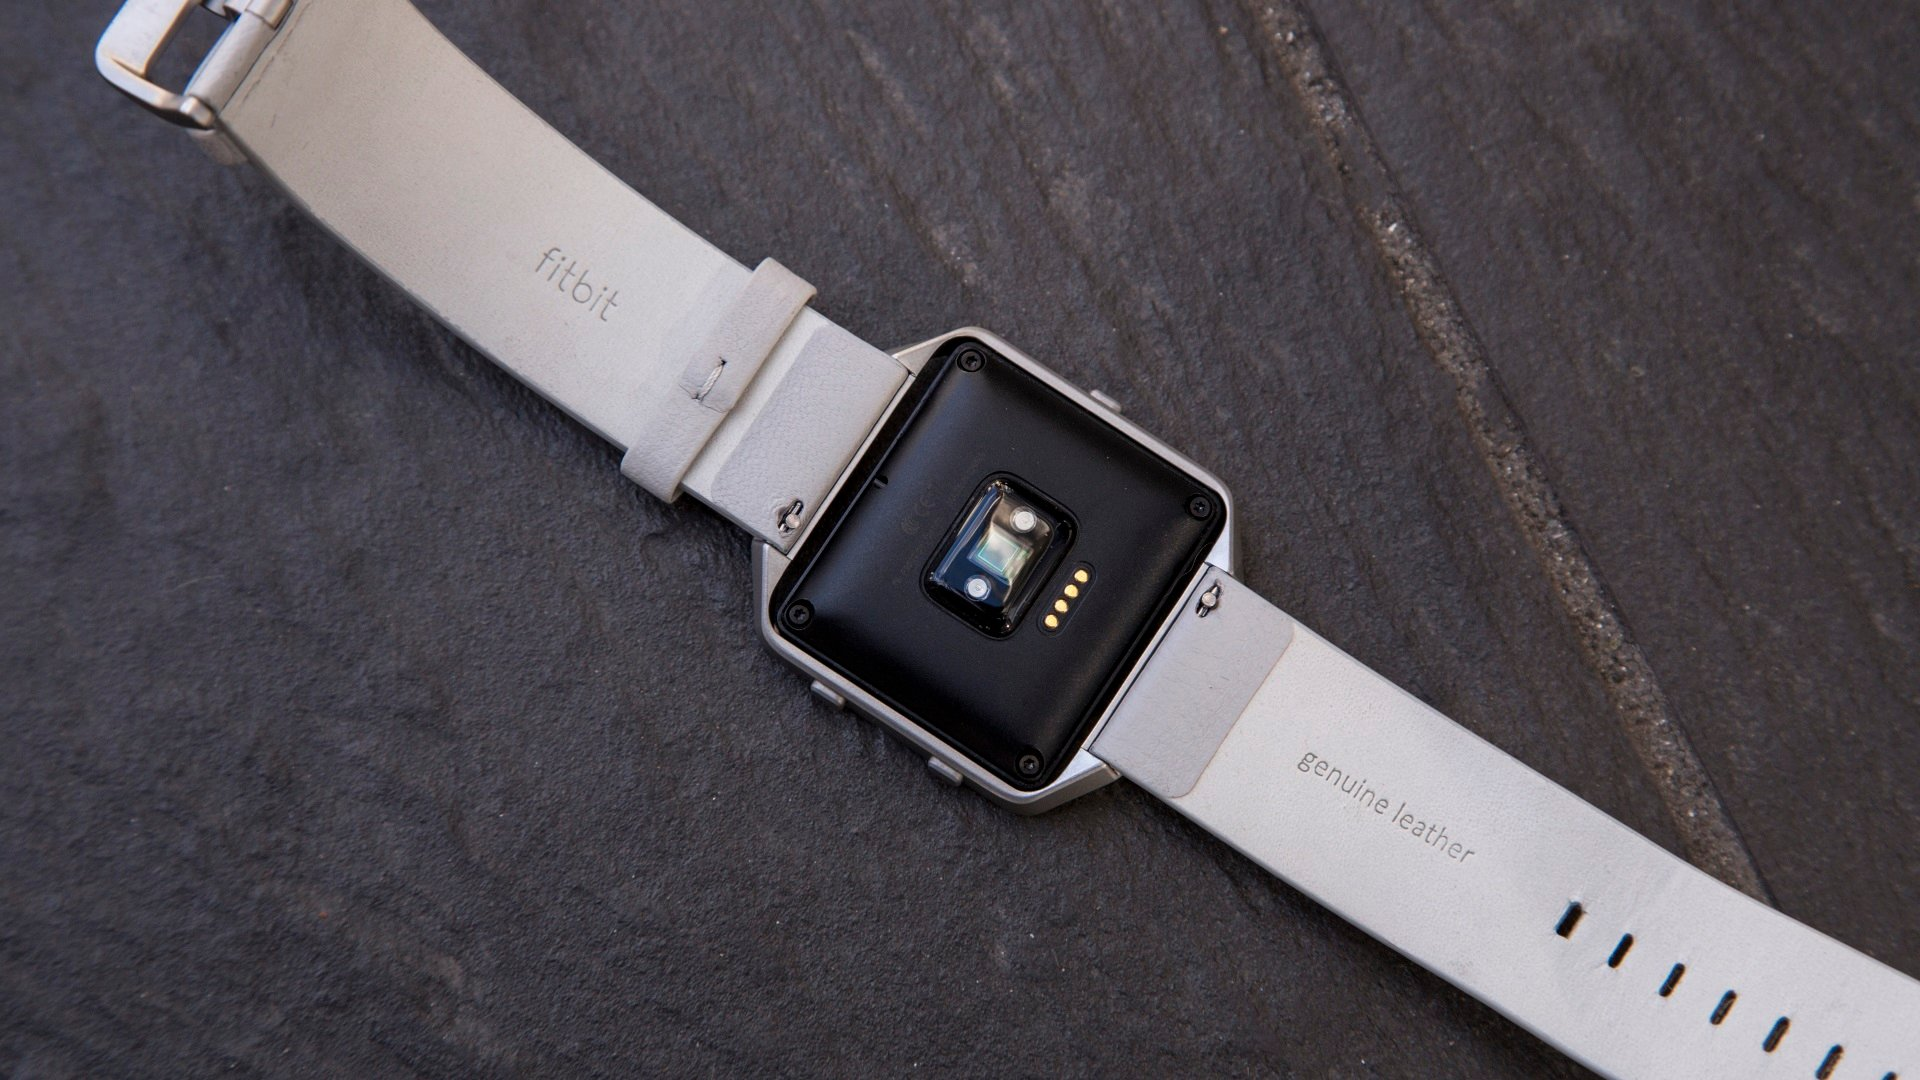 Fitbit Blaze review: Fitbit's first smartwatch is still